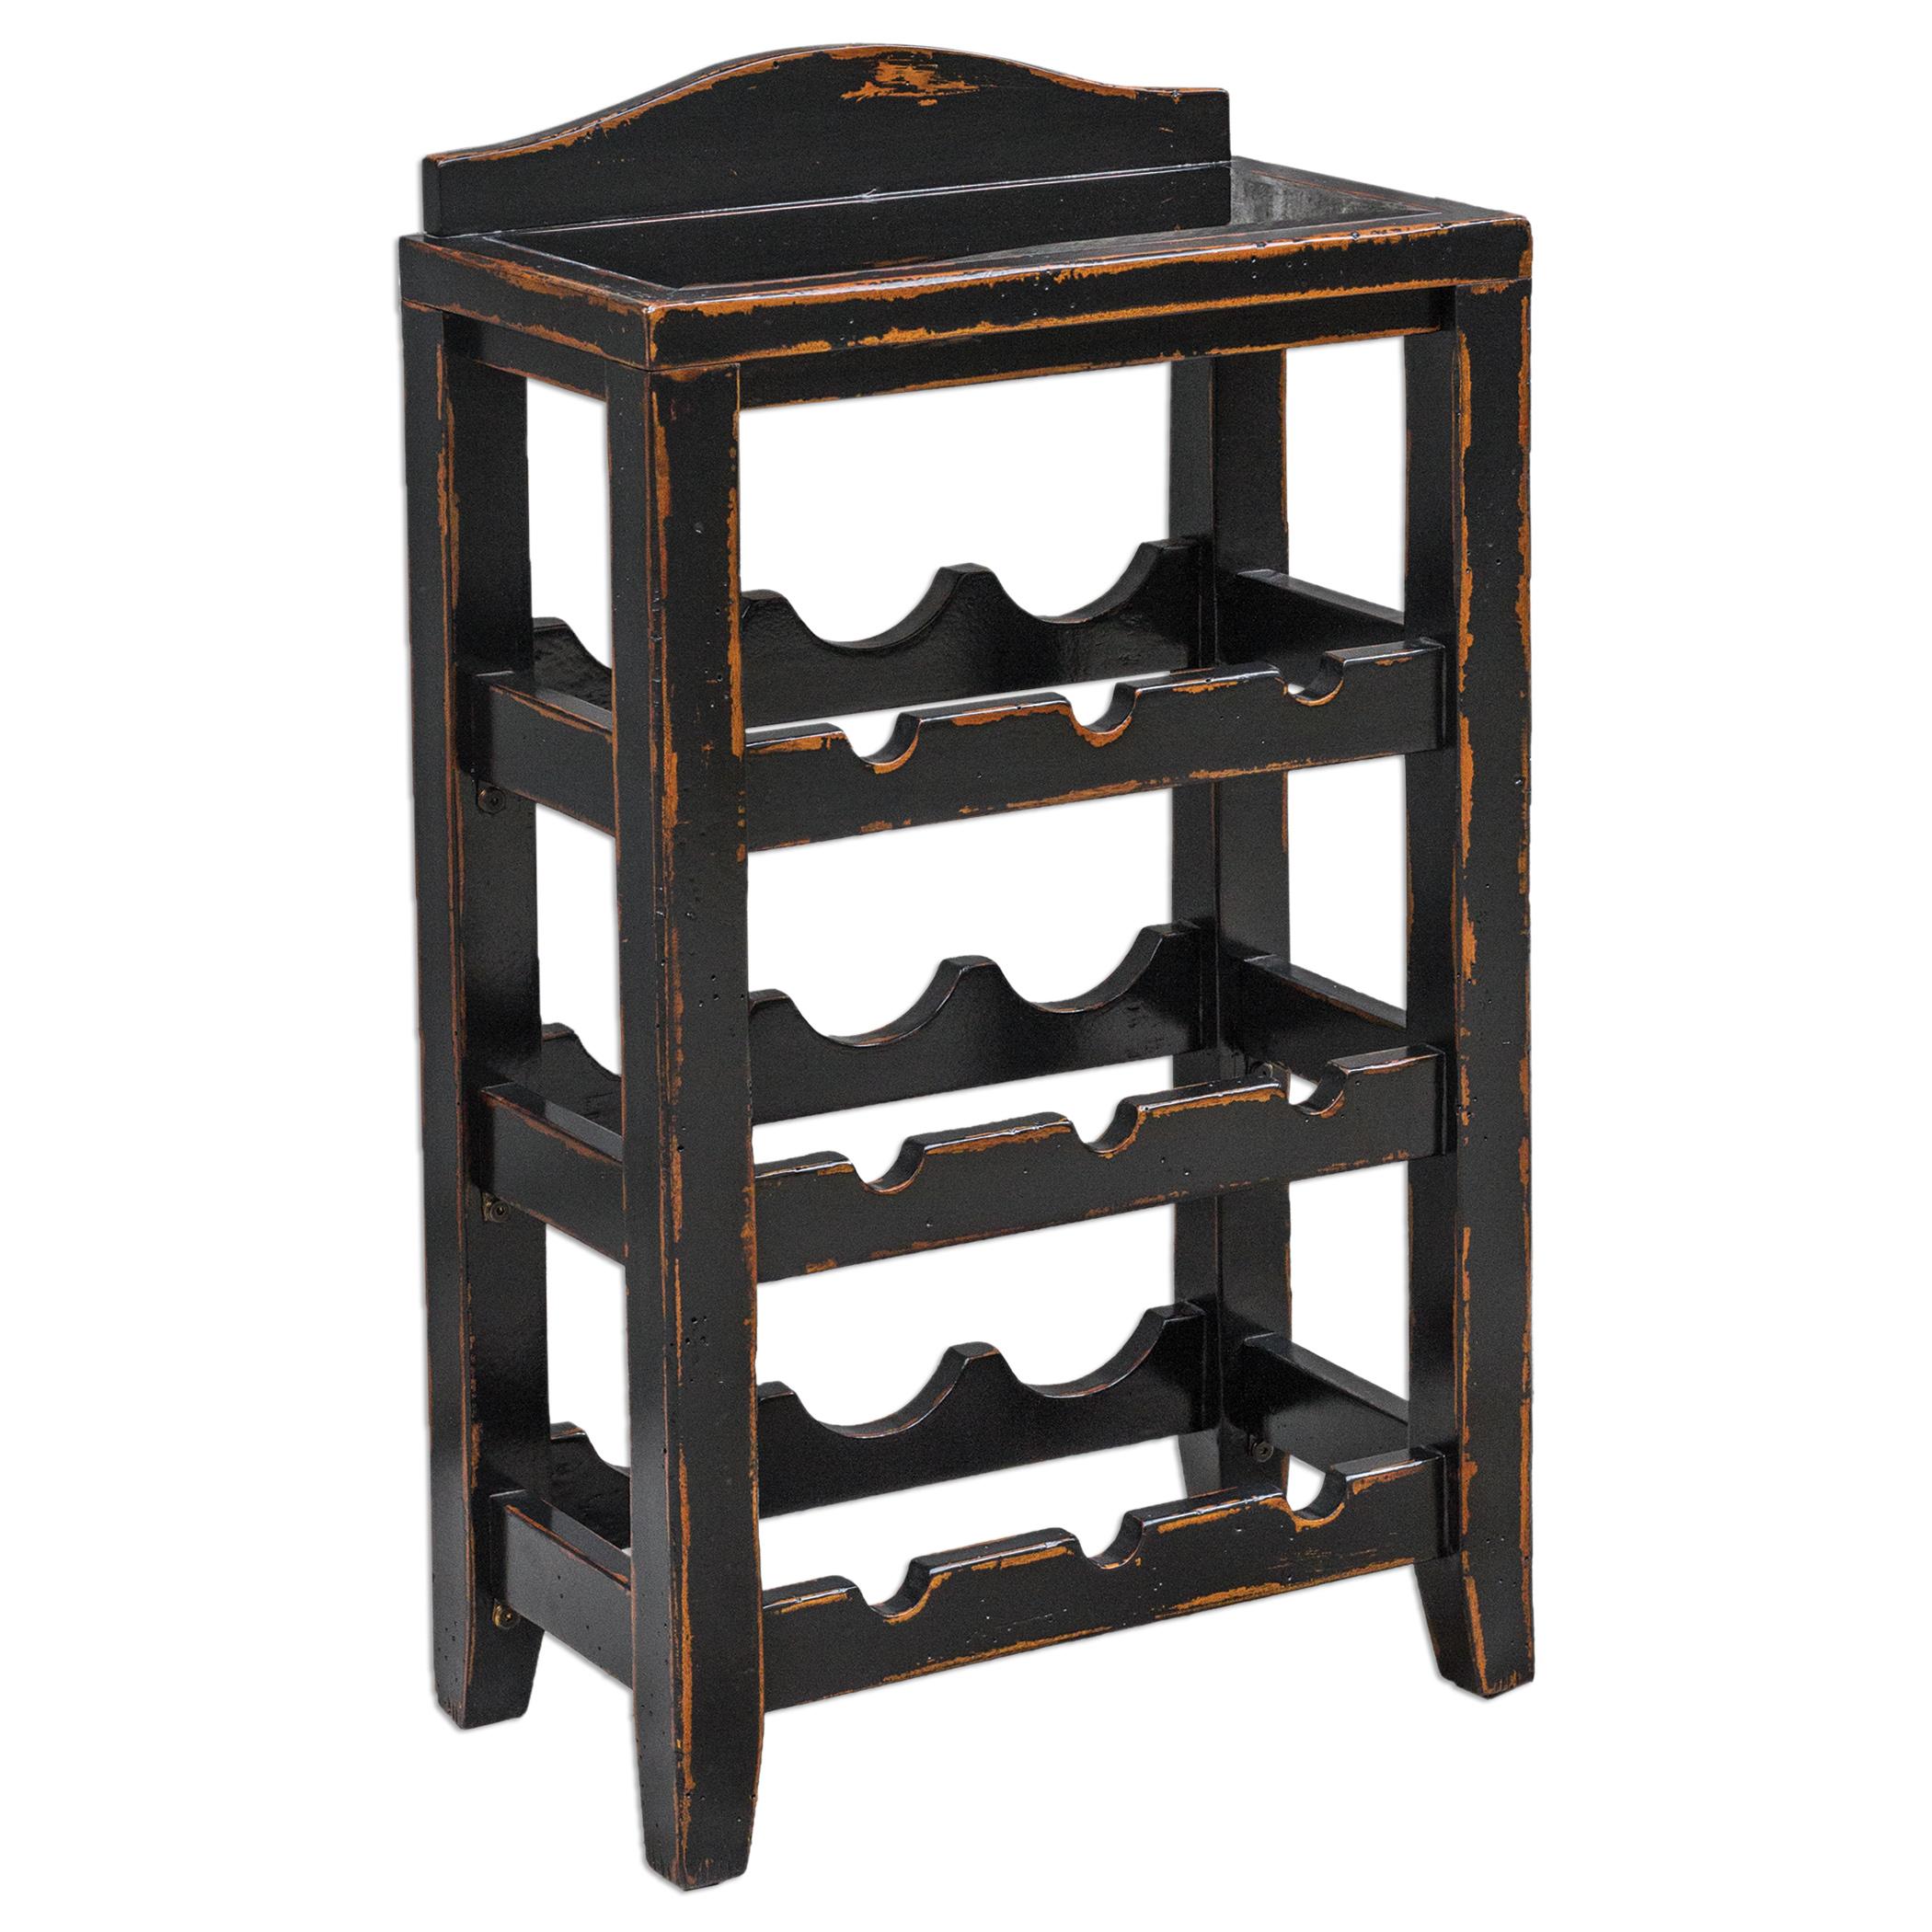 Uttermost Accent Furniture Halton Wine Rack Table - Item Number: 25672